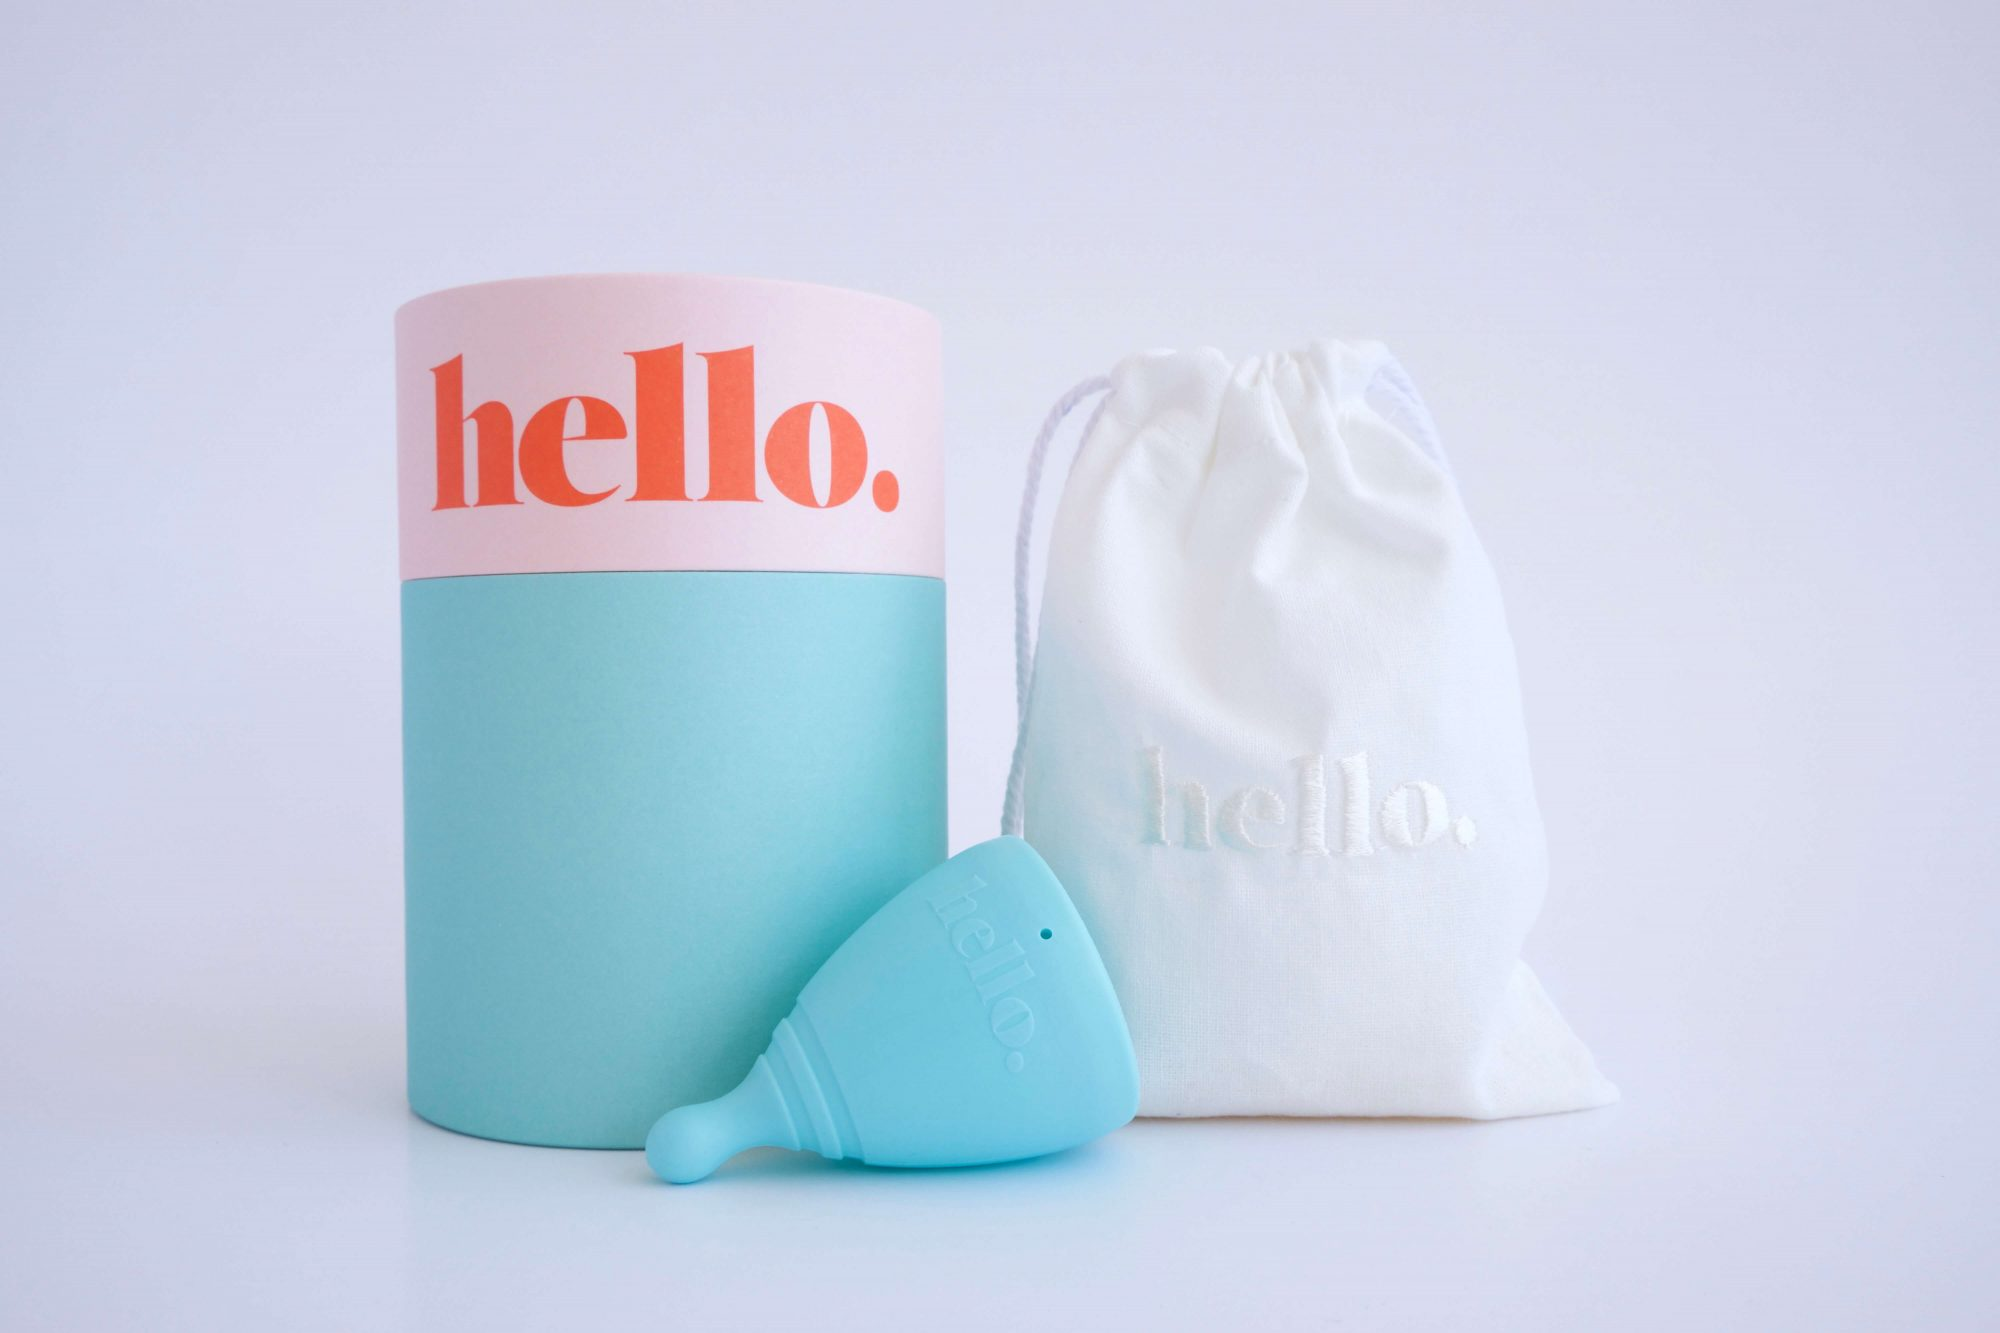 hello cup